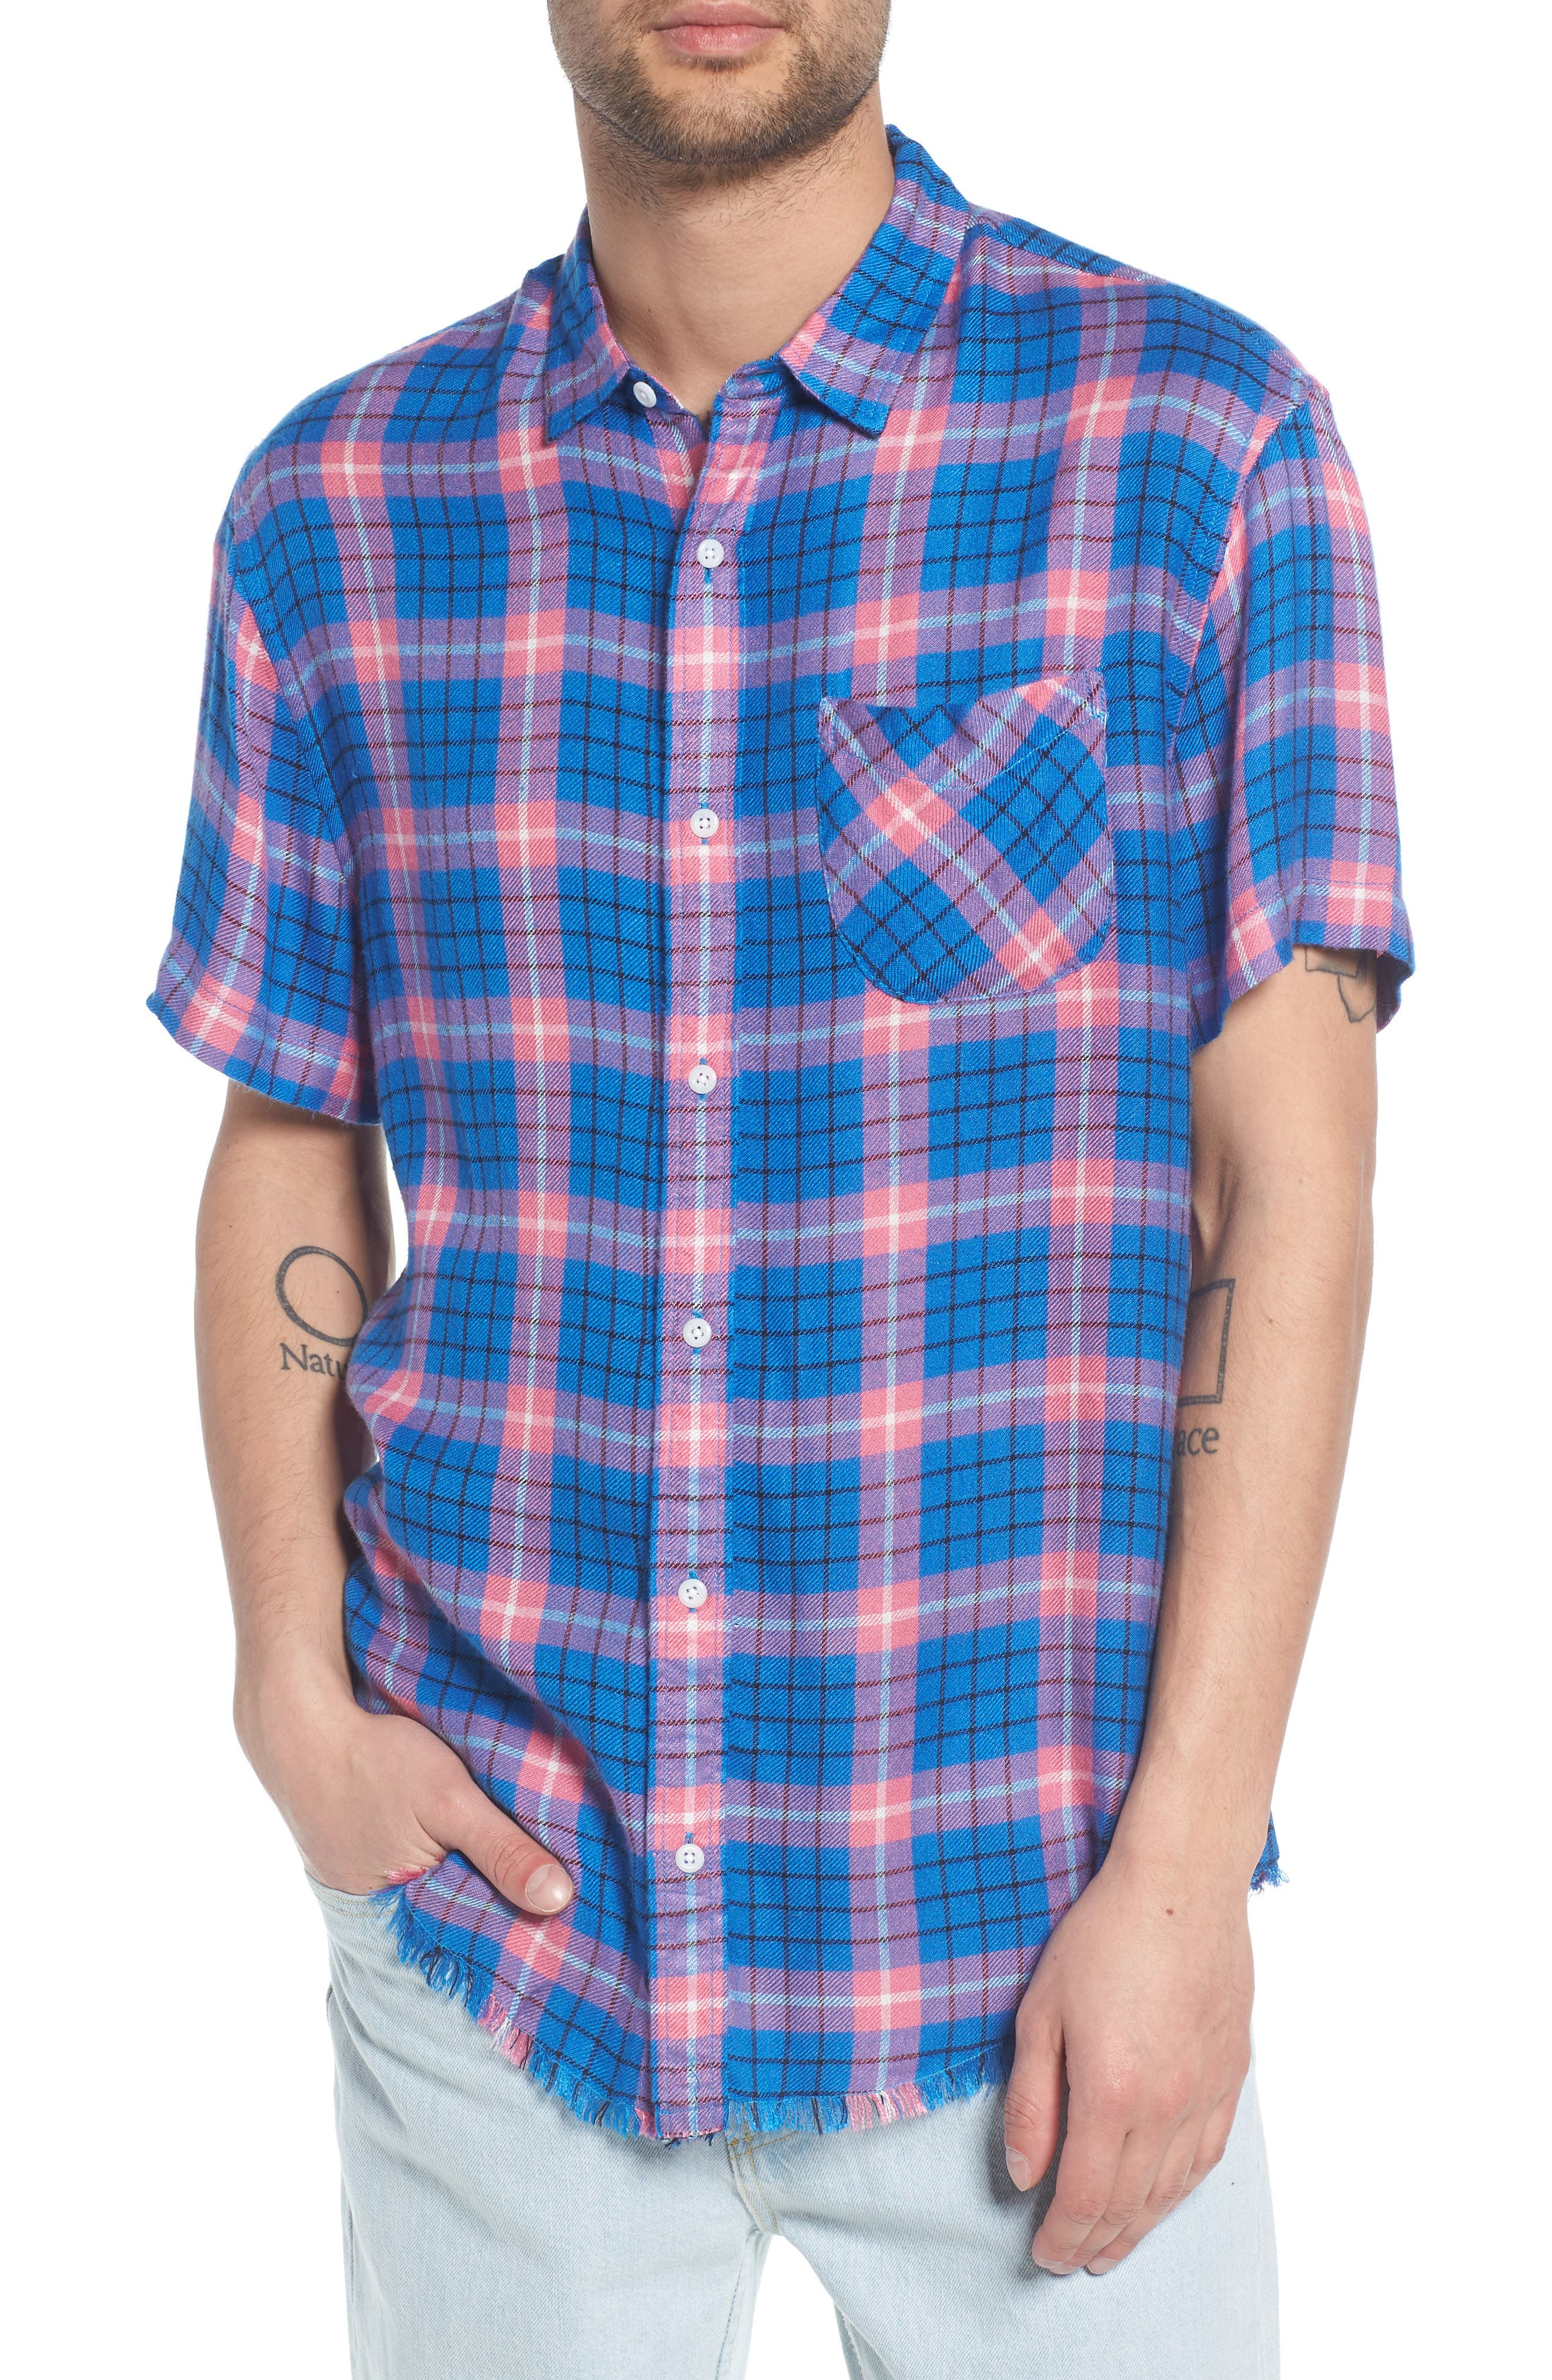 Flannel Woven Shirt,                             Main thumbnail 1, color,                             Blue Camp Pink Beck Plaid